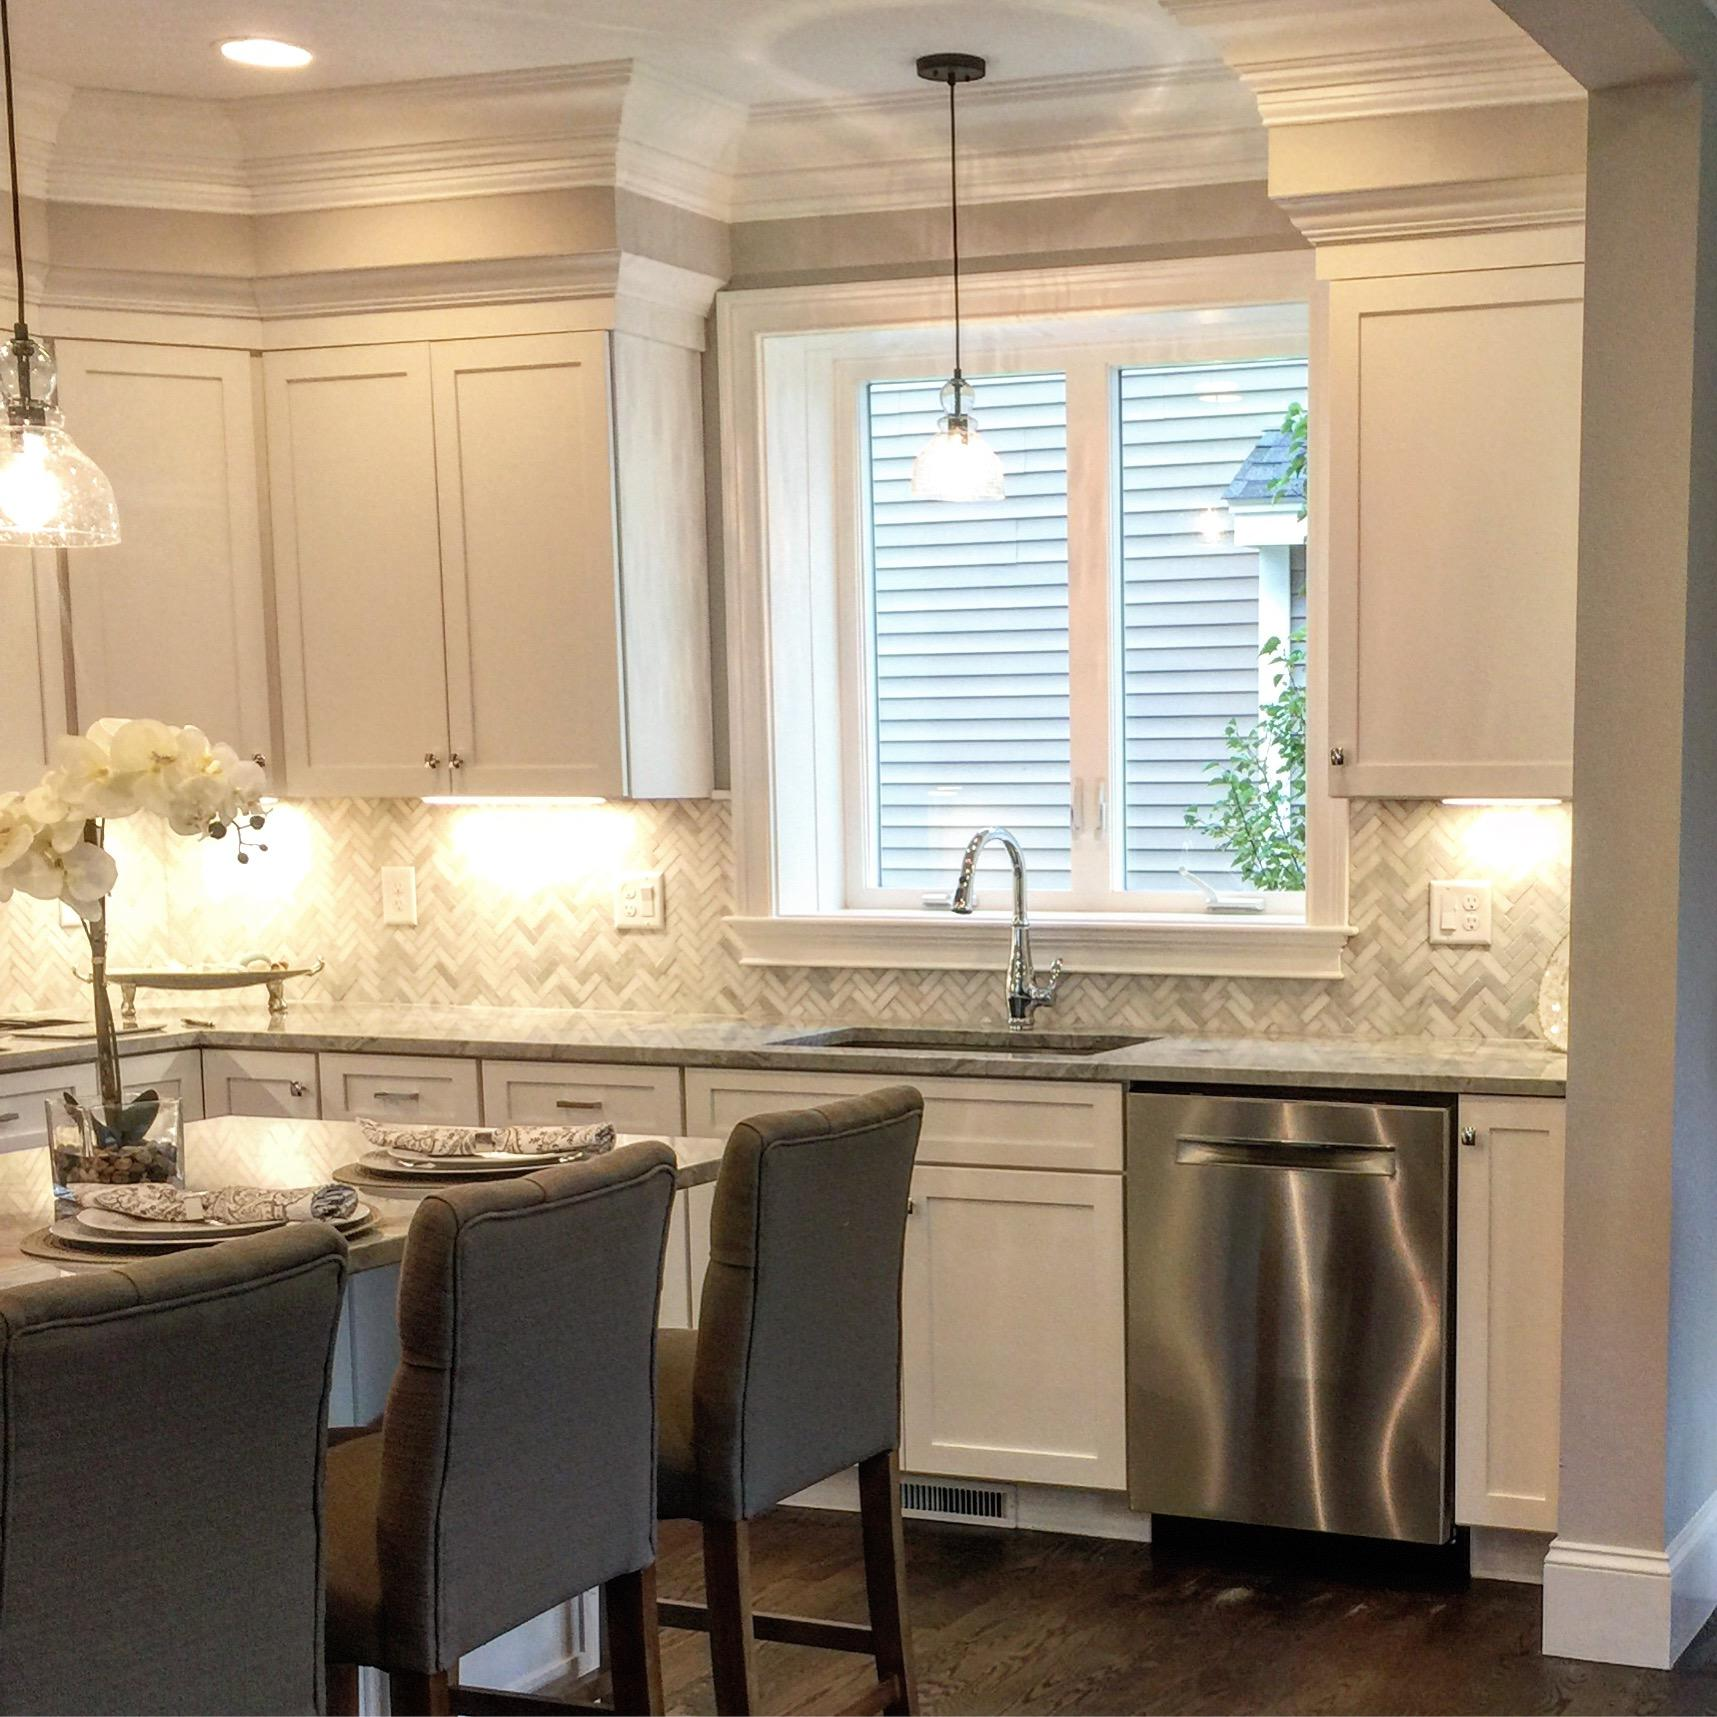 Creative design interiors kitchen and bath medford for Kitchen and bath